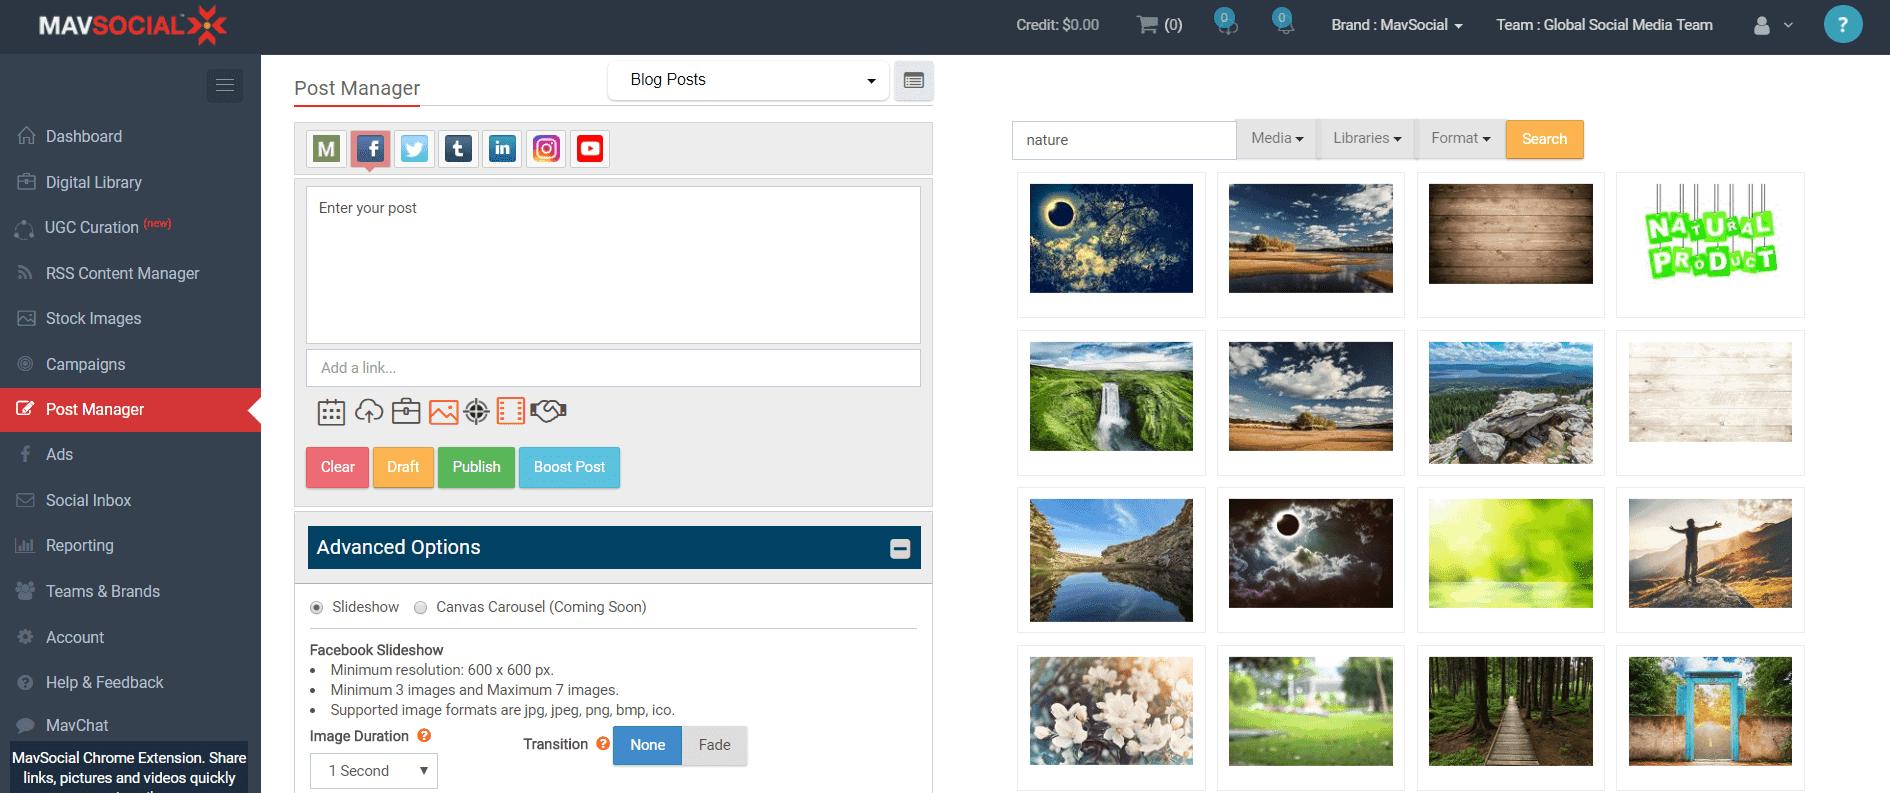 mavsocial-slideshow-feature-screenshot